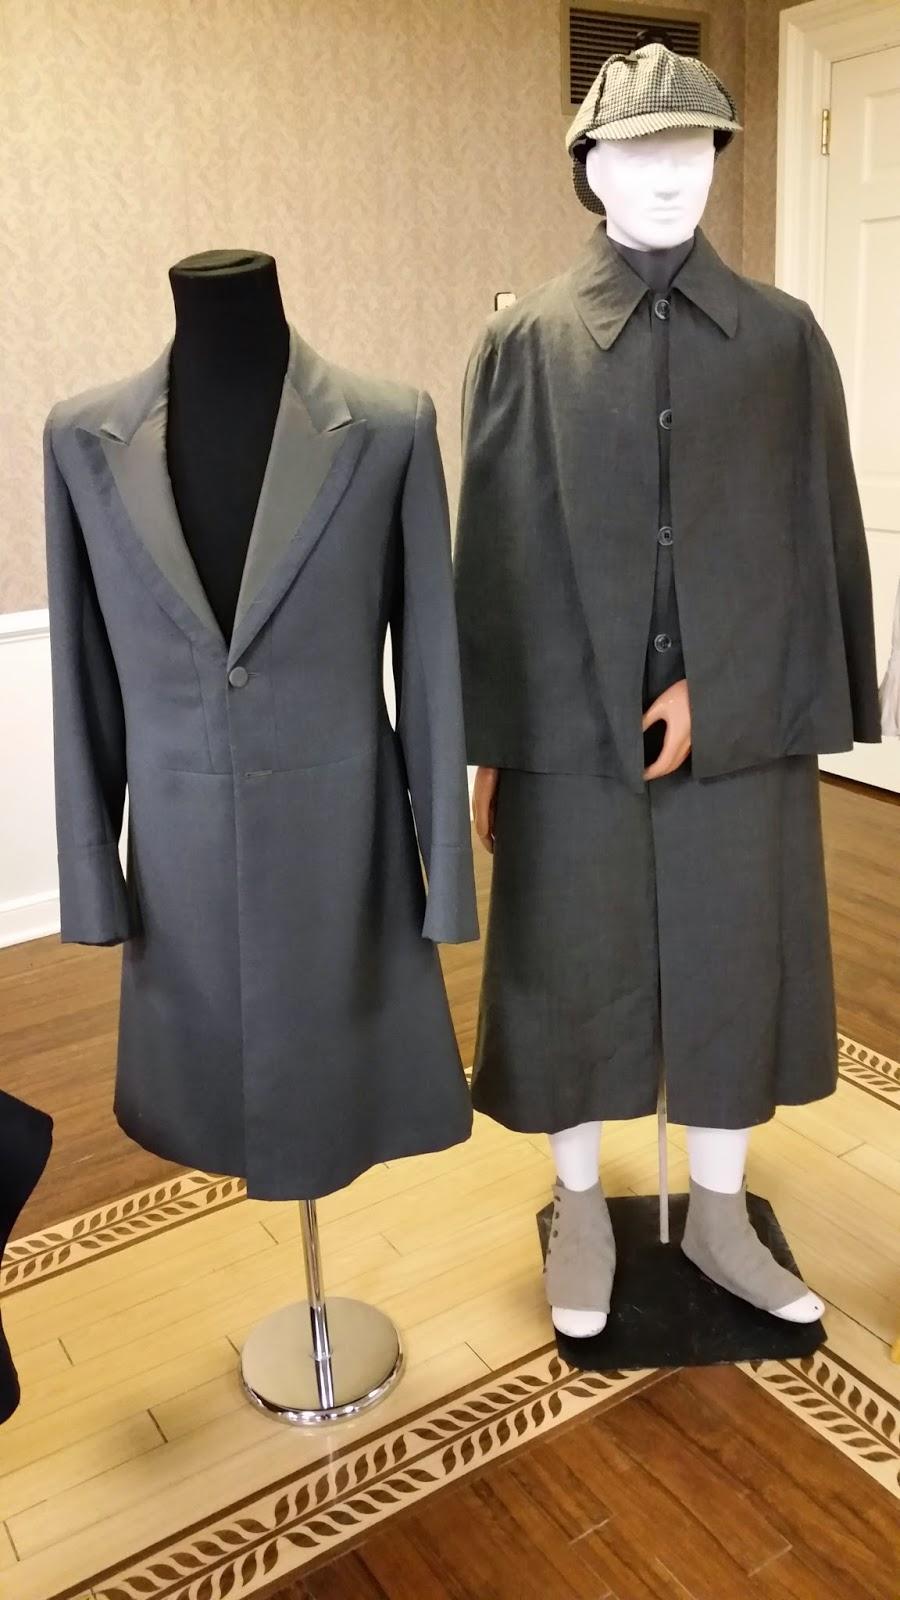 Brett's frock coat from Granada's Sherlock Holmes